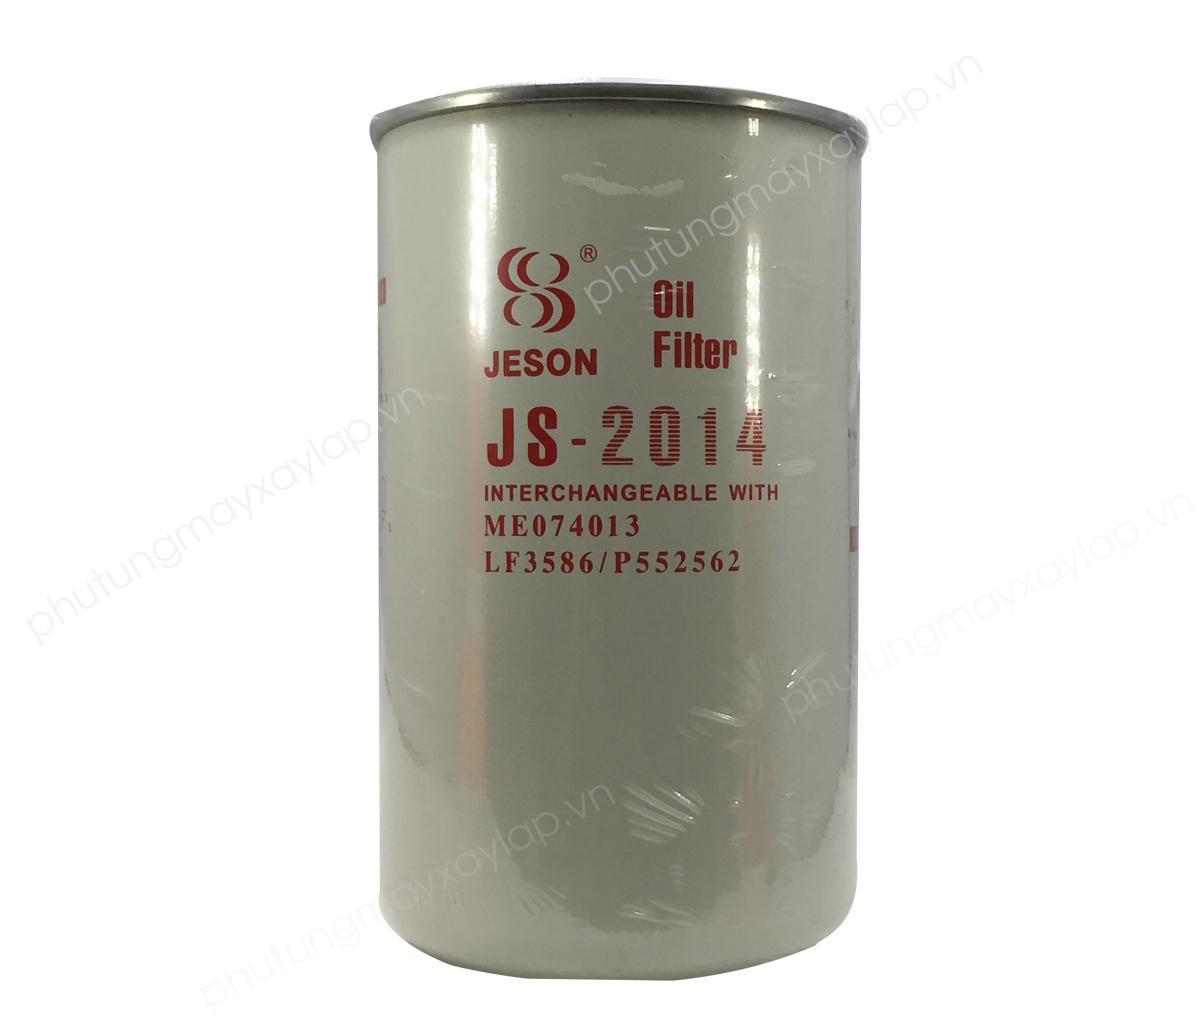 Lọc dầu JS2014-C1007